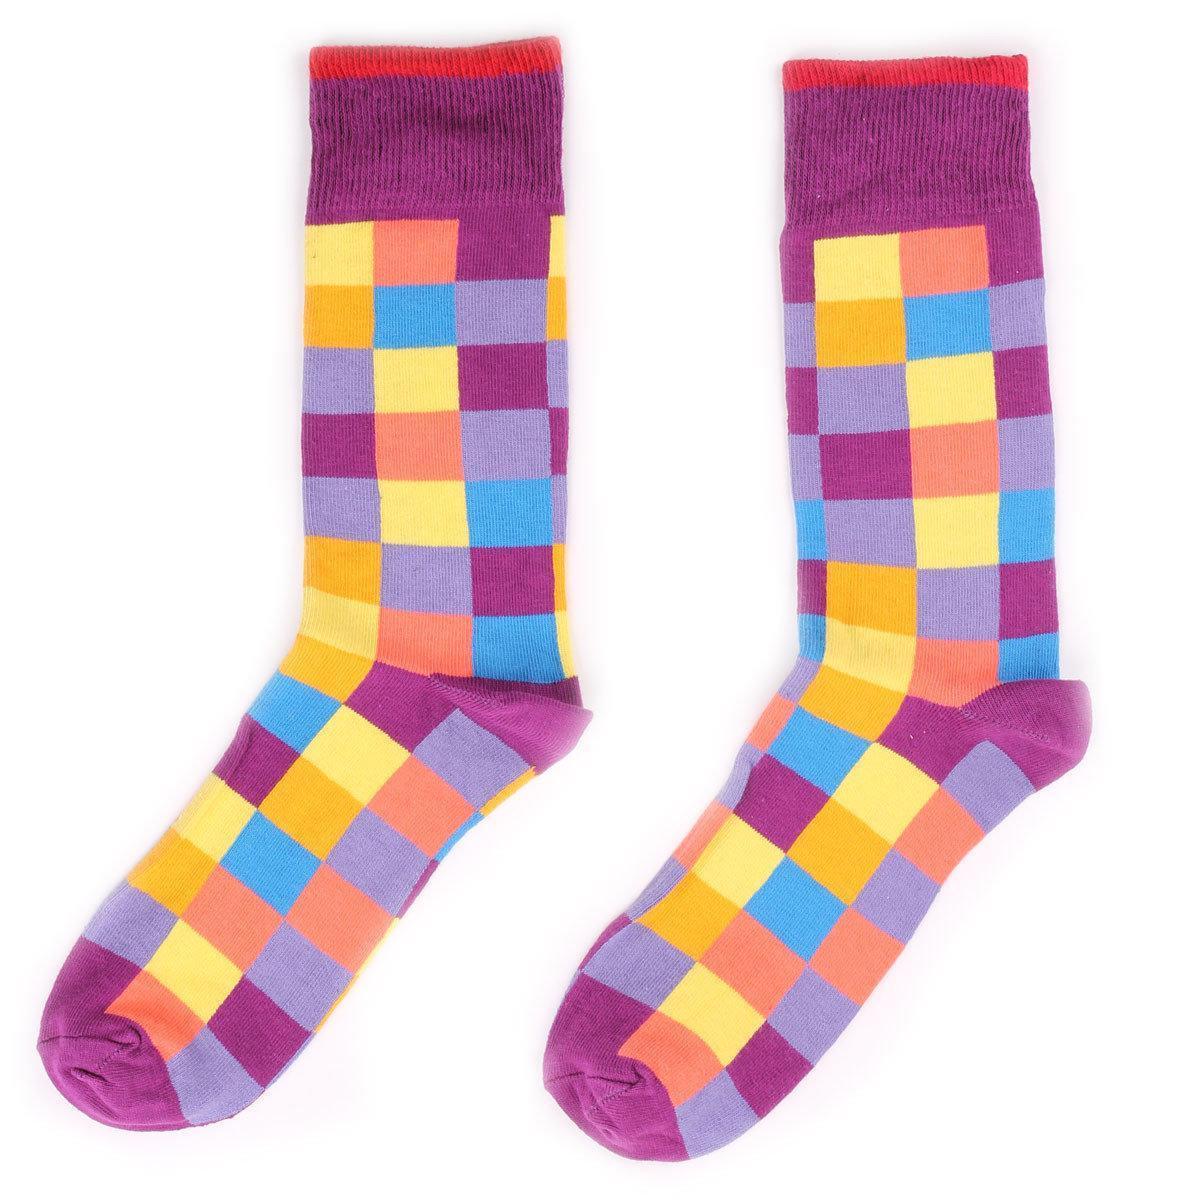 Мужские носки Sammy Icon Squares 40-46 Цветные (009084)